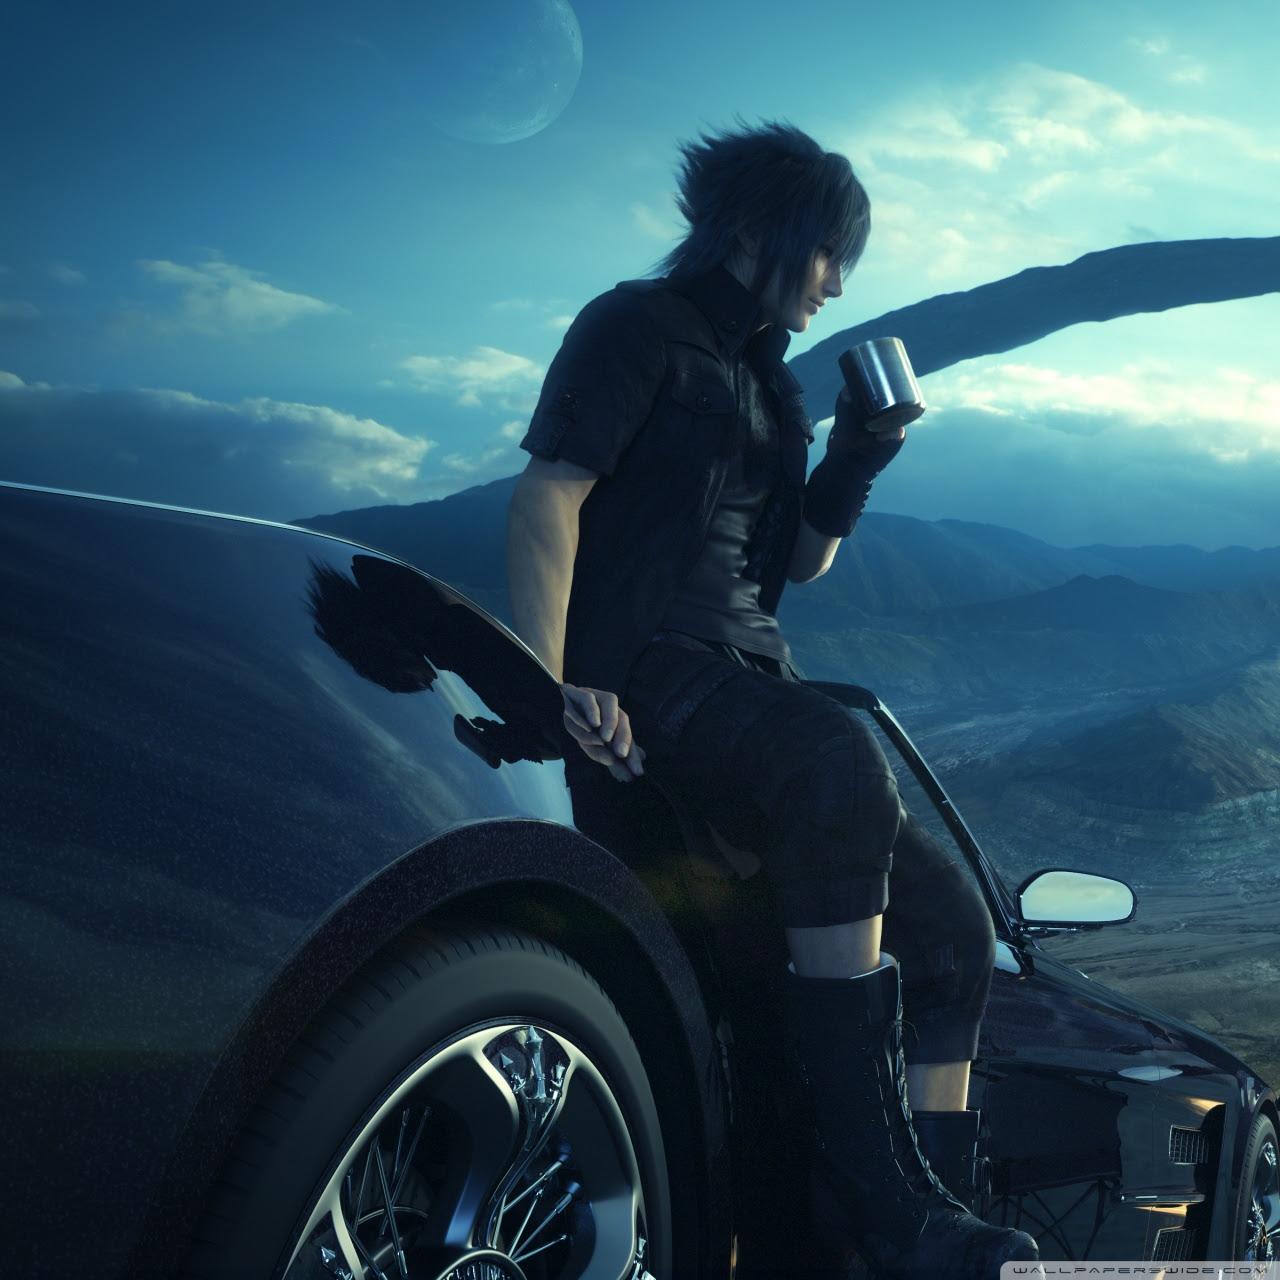 Final Fantasy Xv Ultra Hd Desktop Background Wallpaper For 4k Uhd